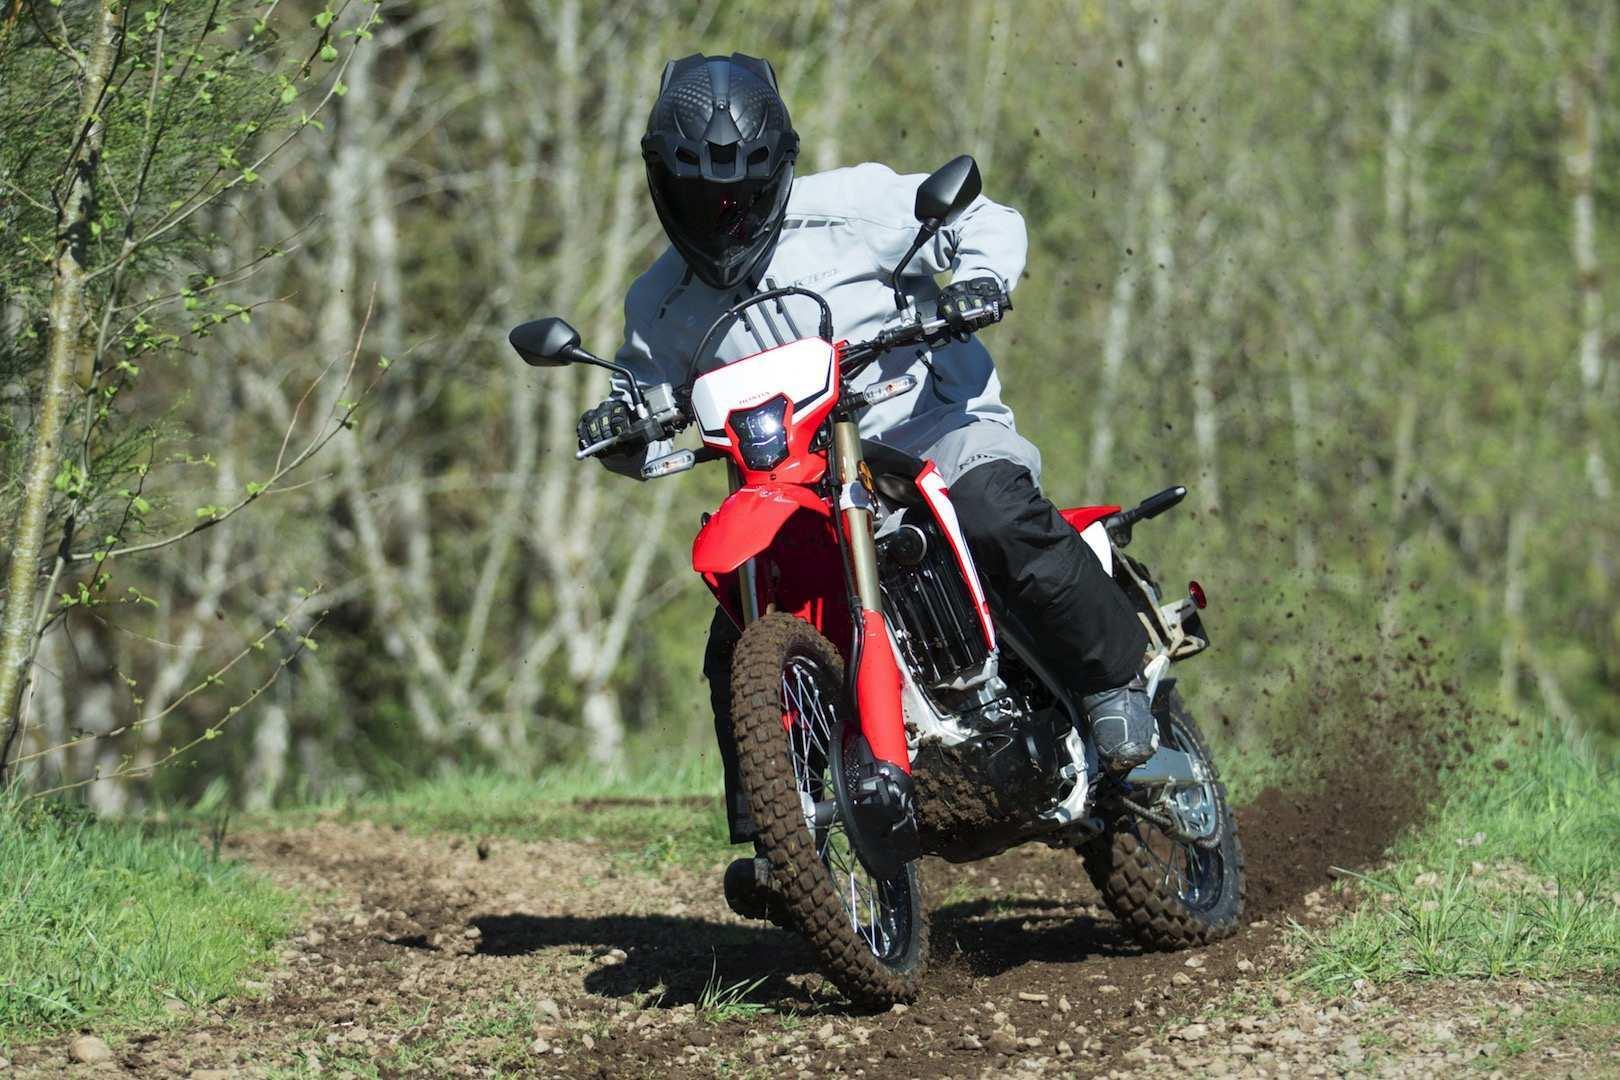 35 Gallery of 2019 Honda 450 Dual Sport Ratings with 2019 Honda 450 Dual Sport